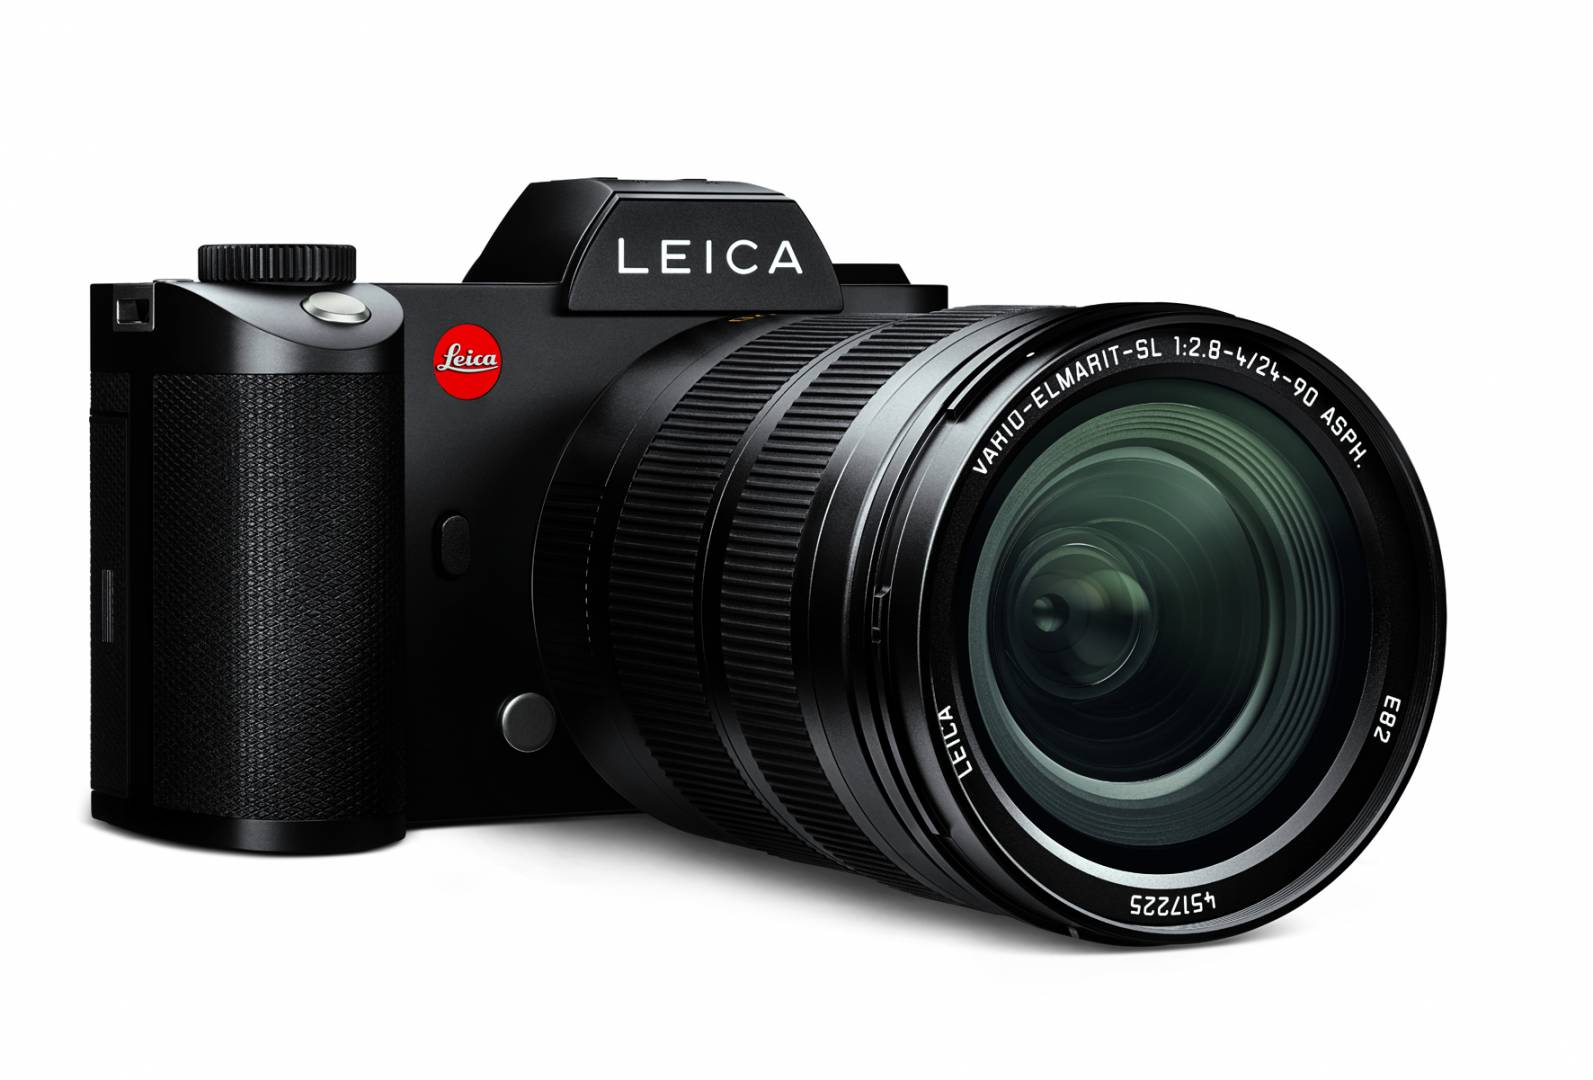 Leica SL price plummets